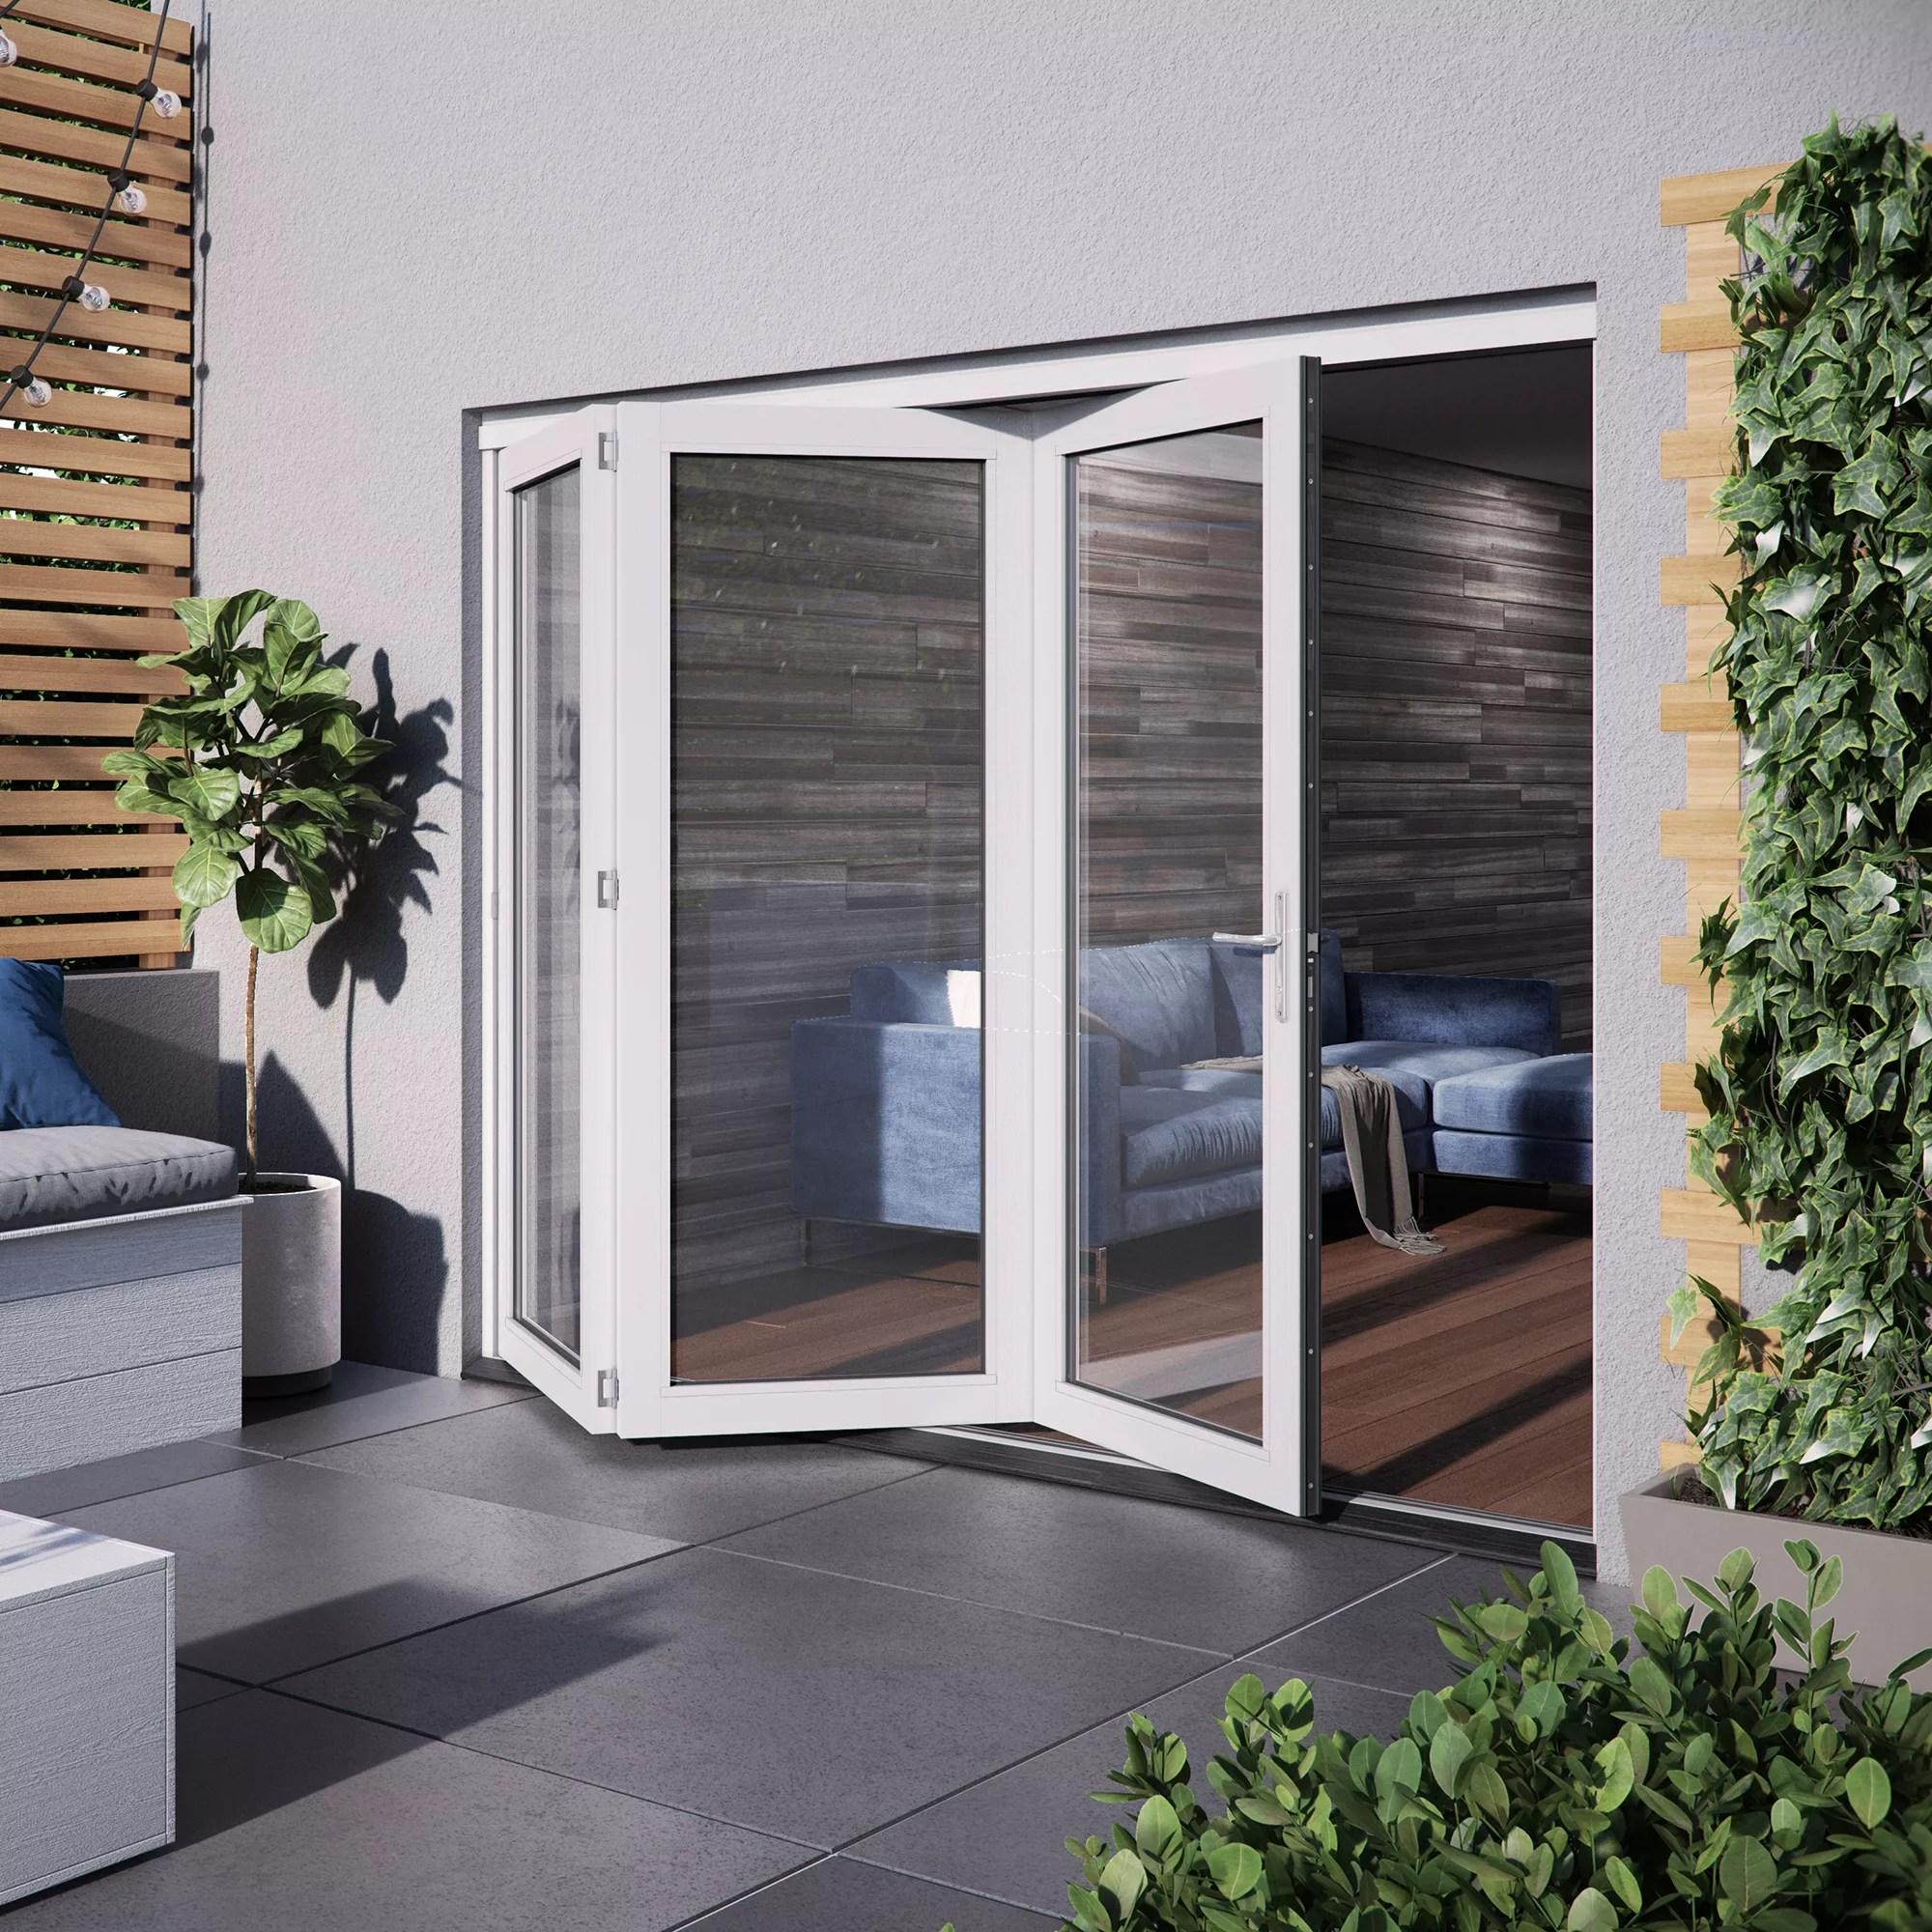 jeld wen bedgebury clear glazed white hardwood reversible external folding patio door set h 2094mm w 1794mm